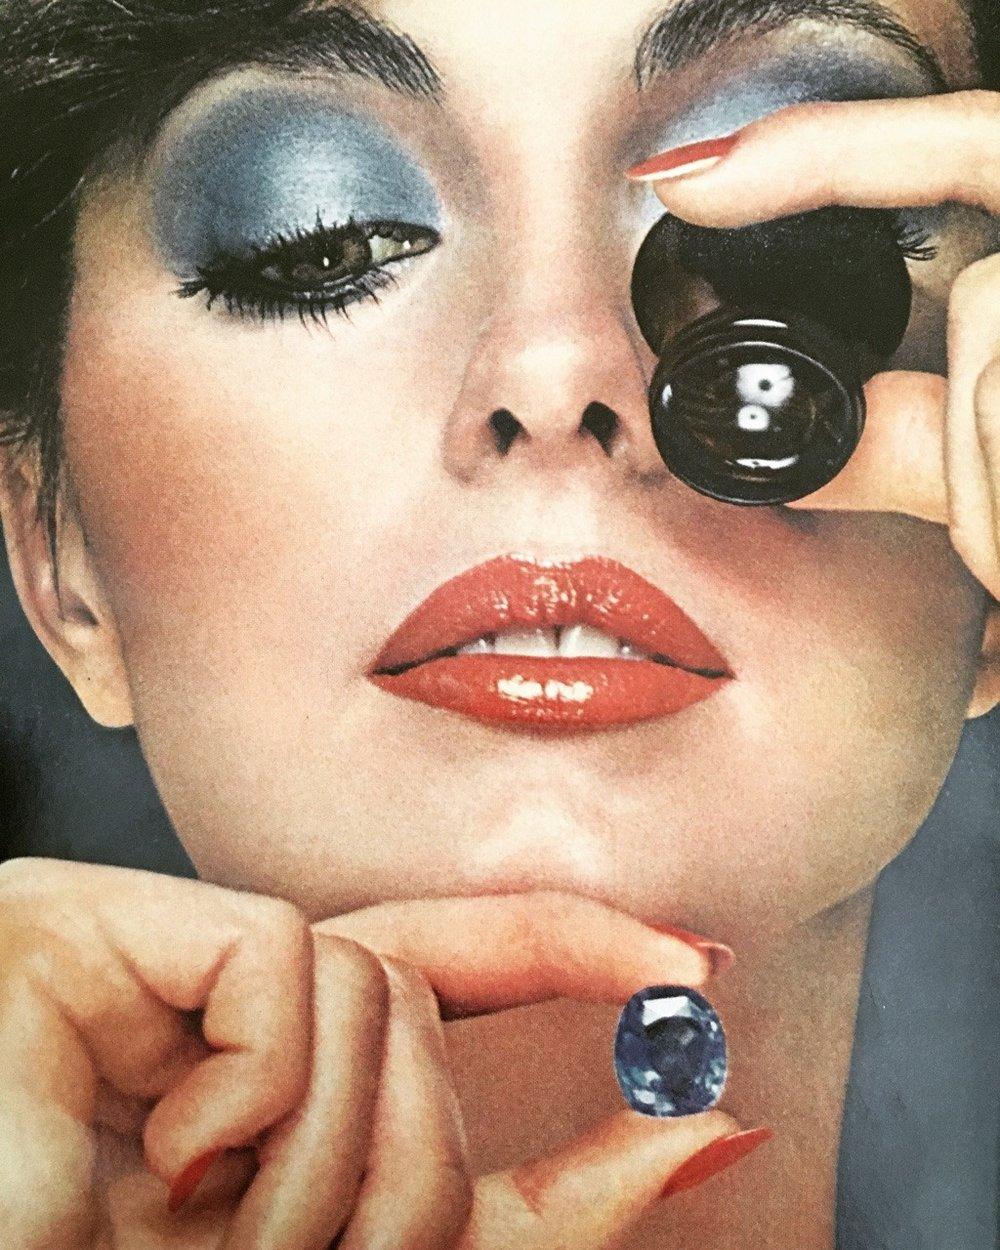 Revlon Colorfrost eyeshadow. Vogue. June 1978